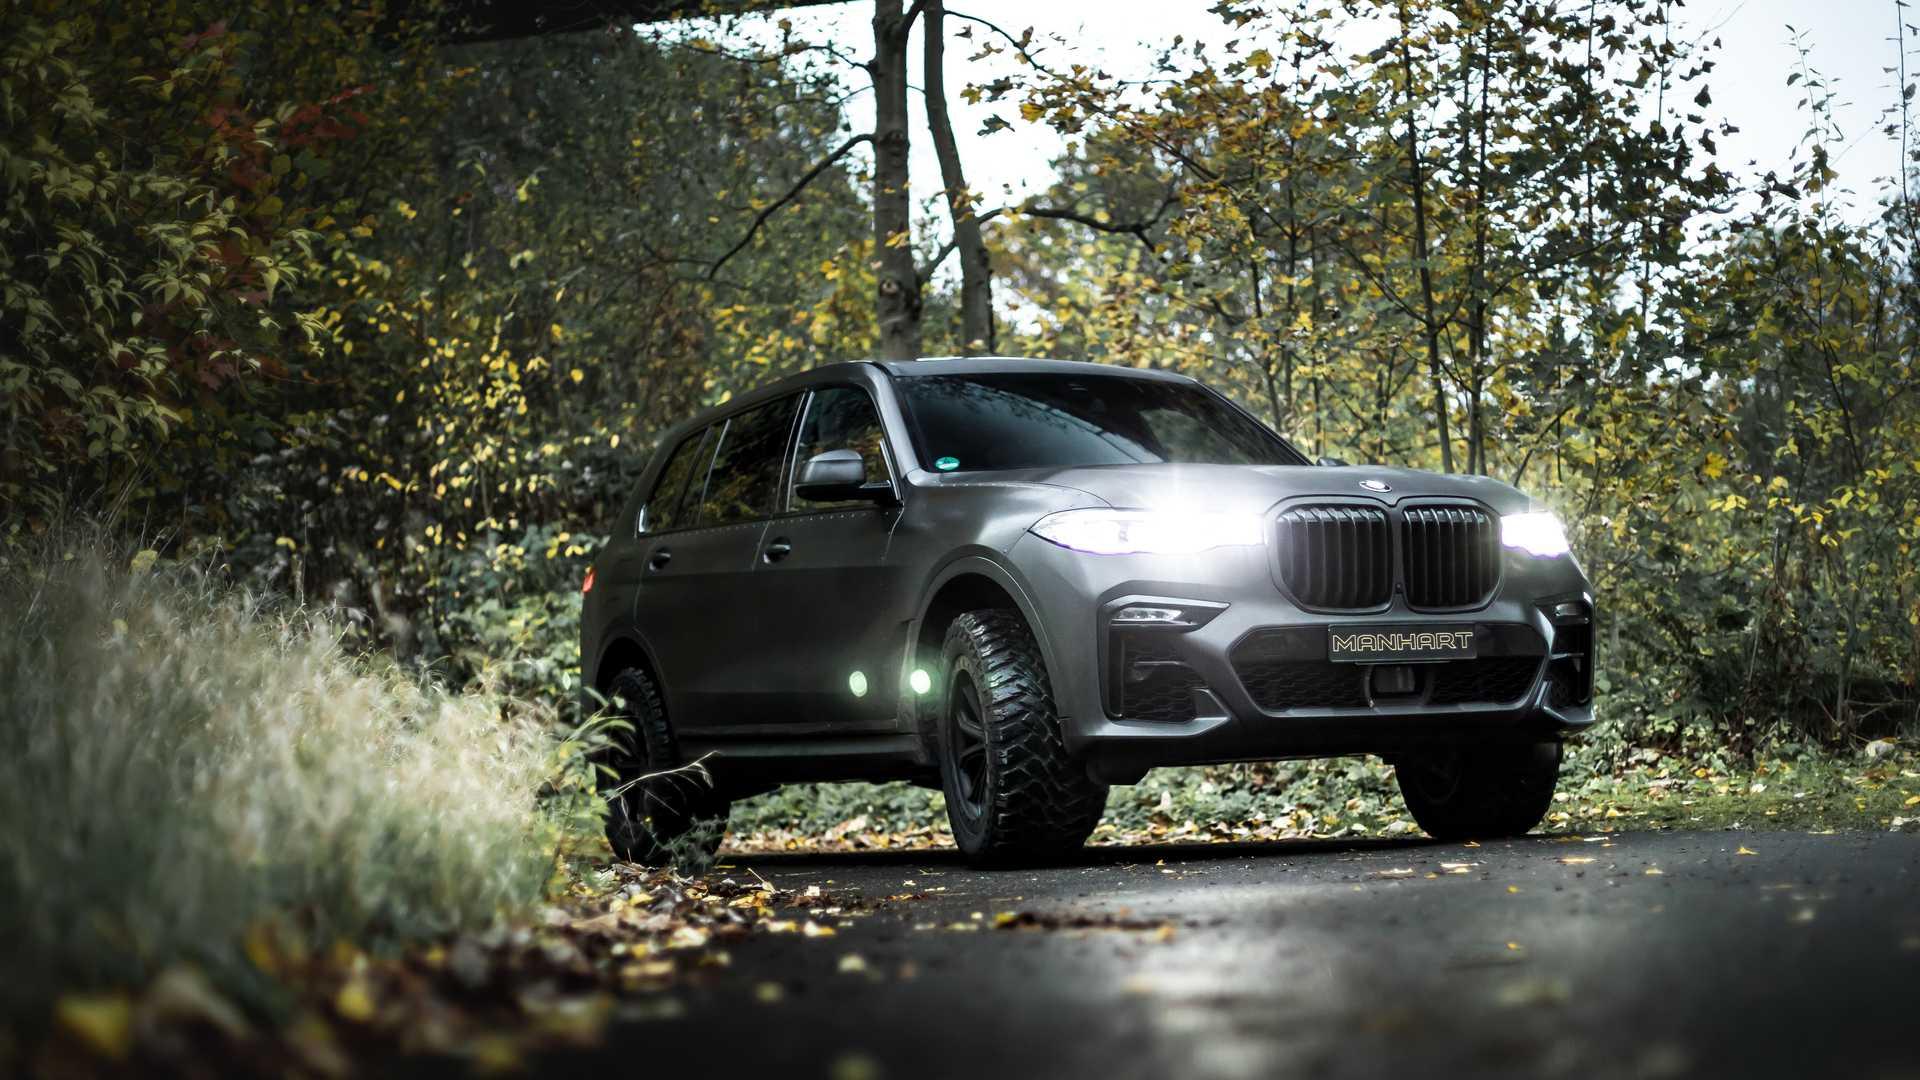 BMW-X7-Dirt-Edition-By-Manhart-3